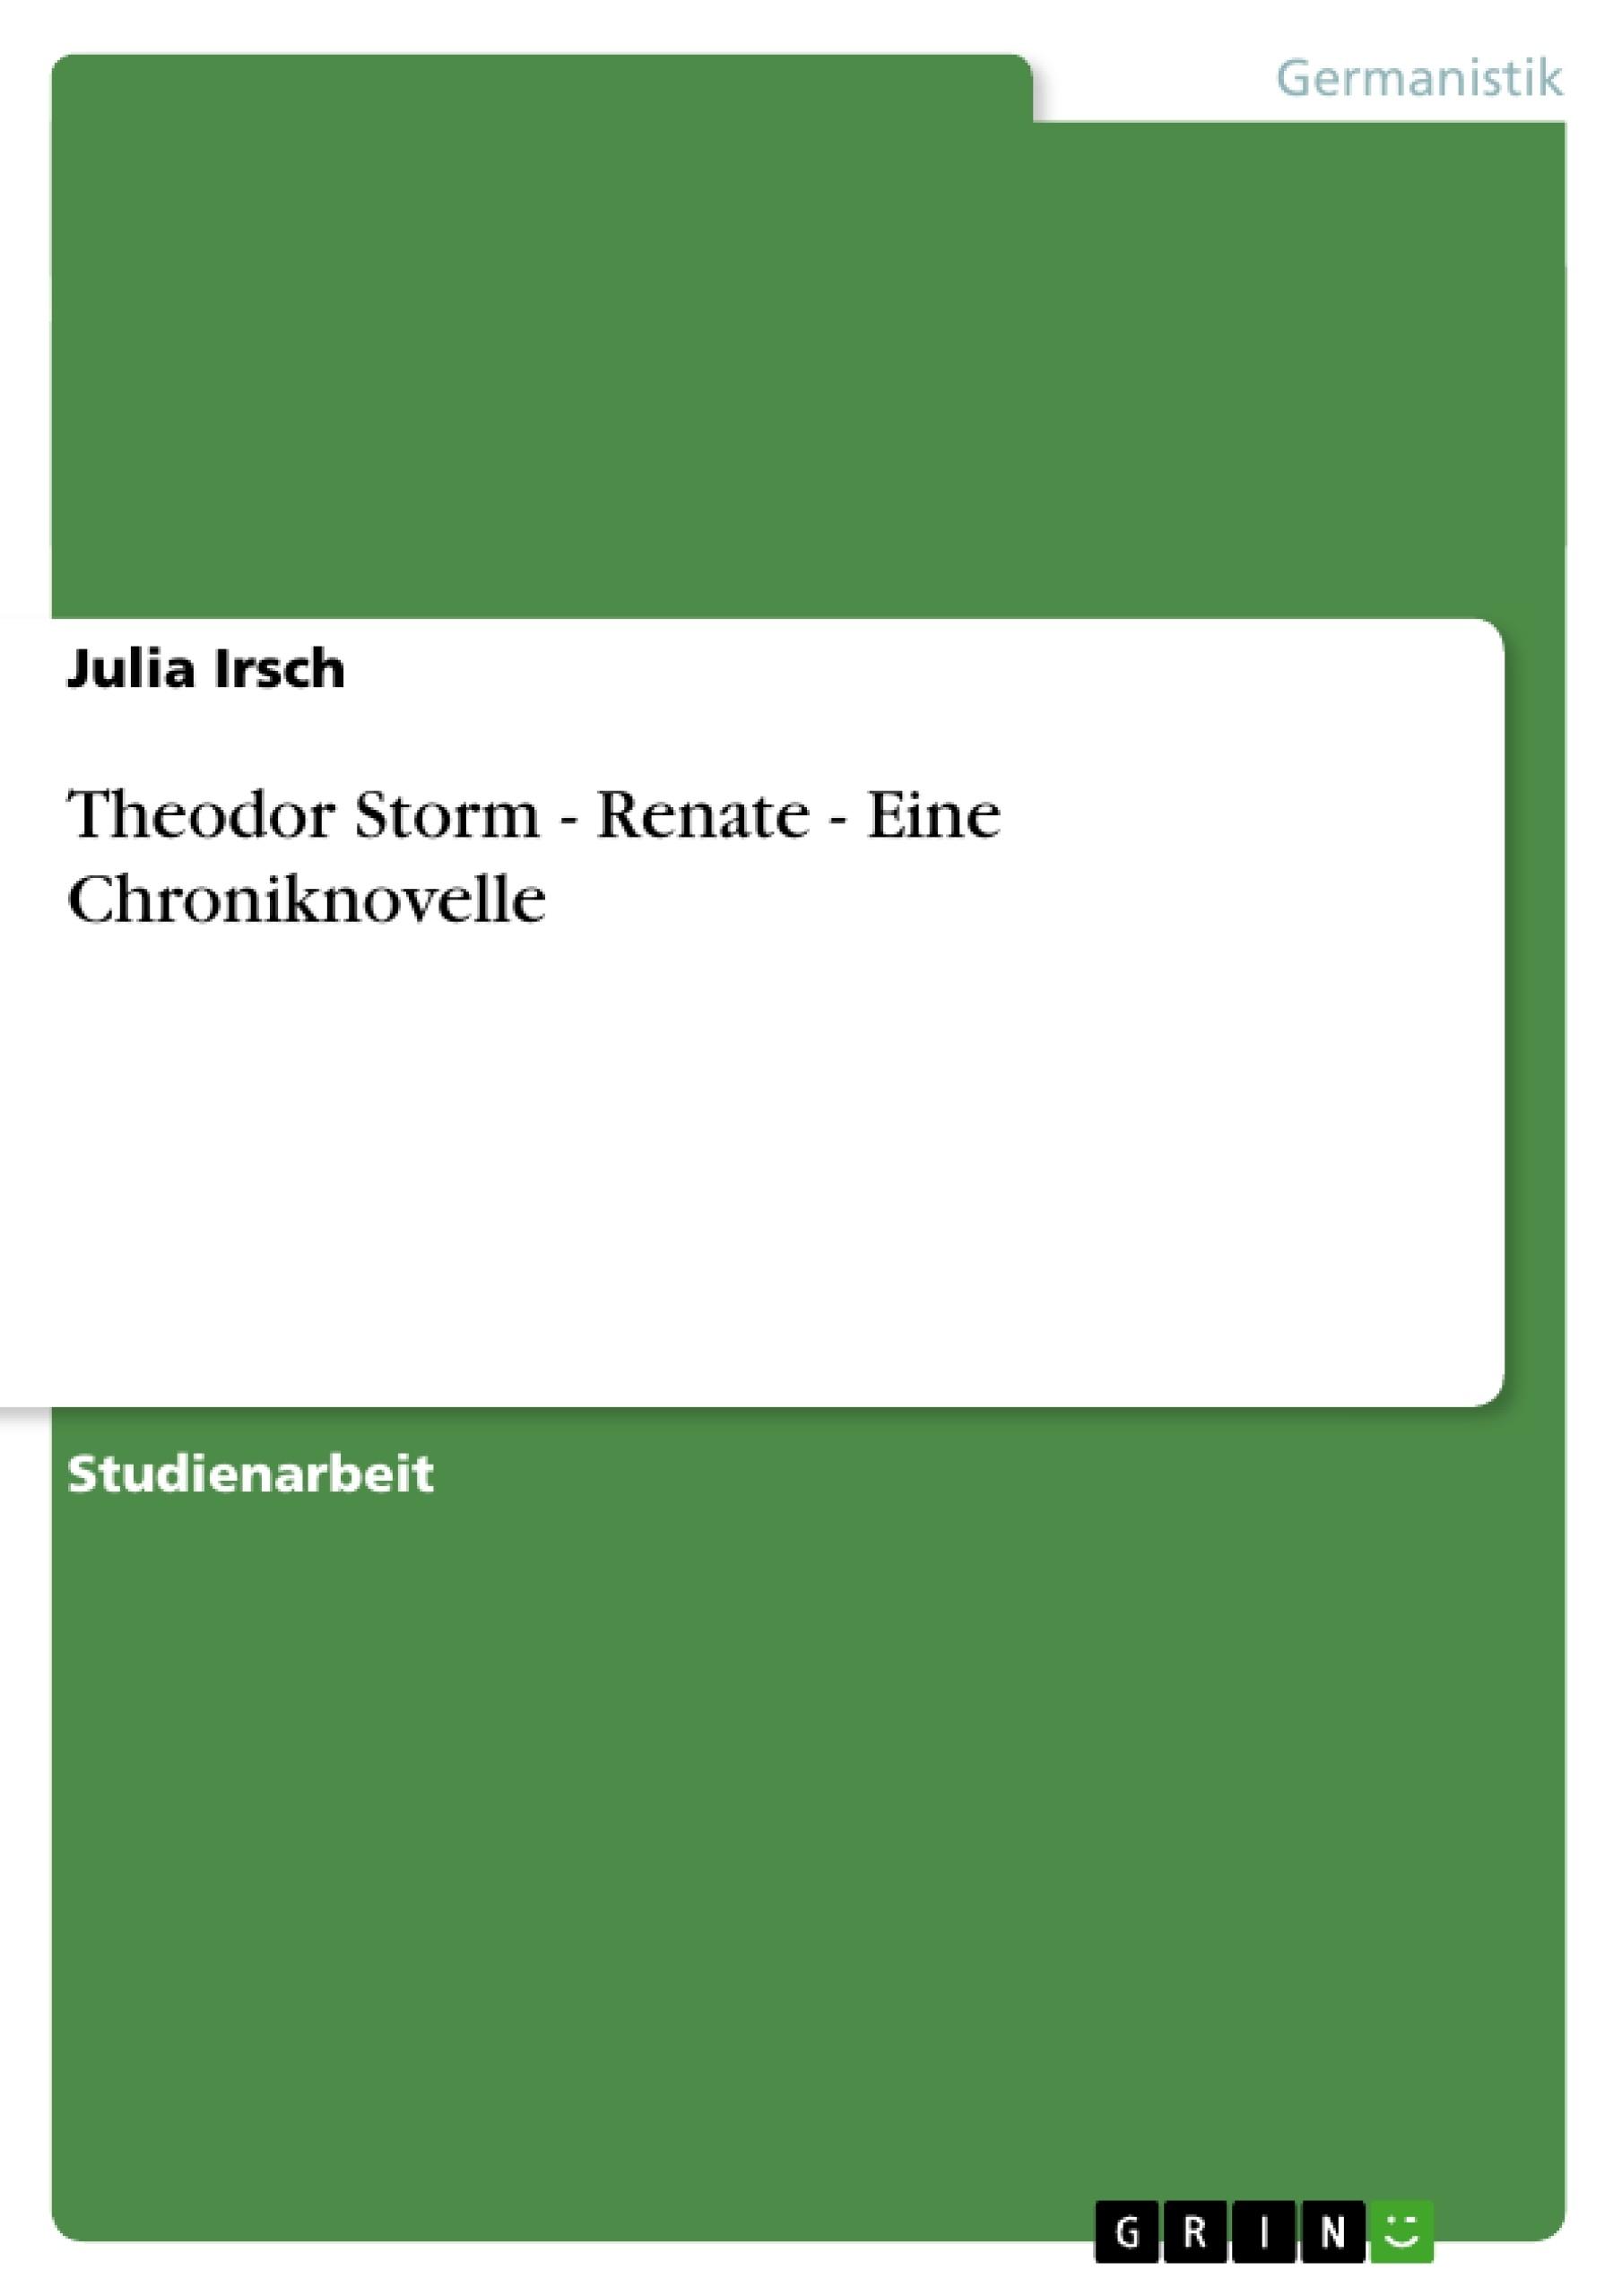 Titel: Theodor Storm - Renate - Eine Chroniknovelle